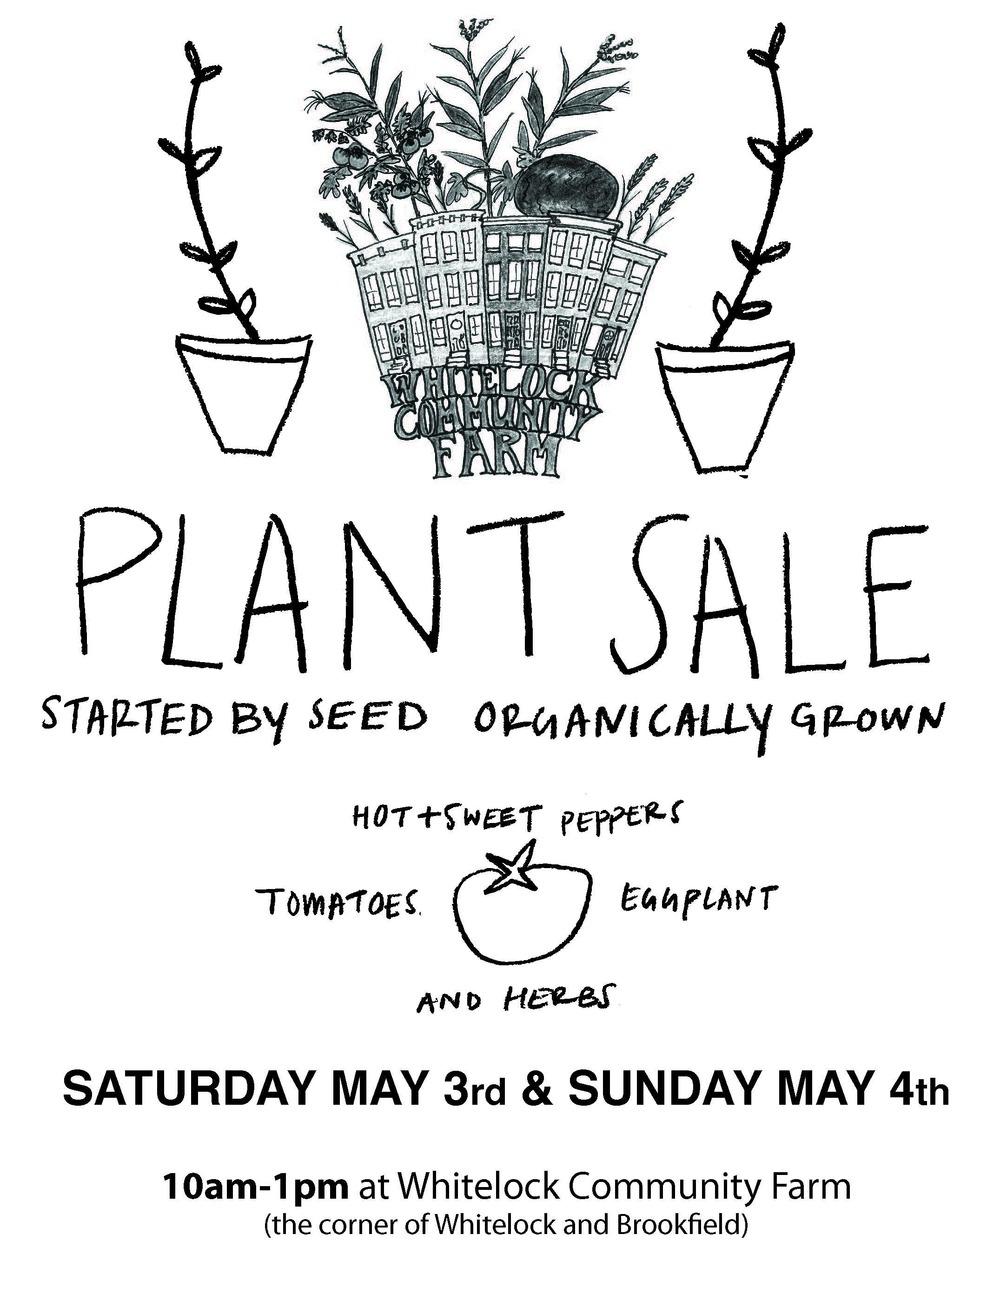 Plantsale